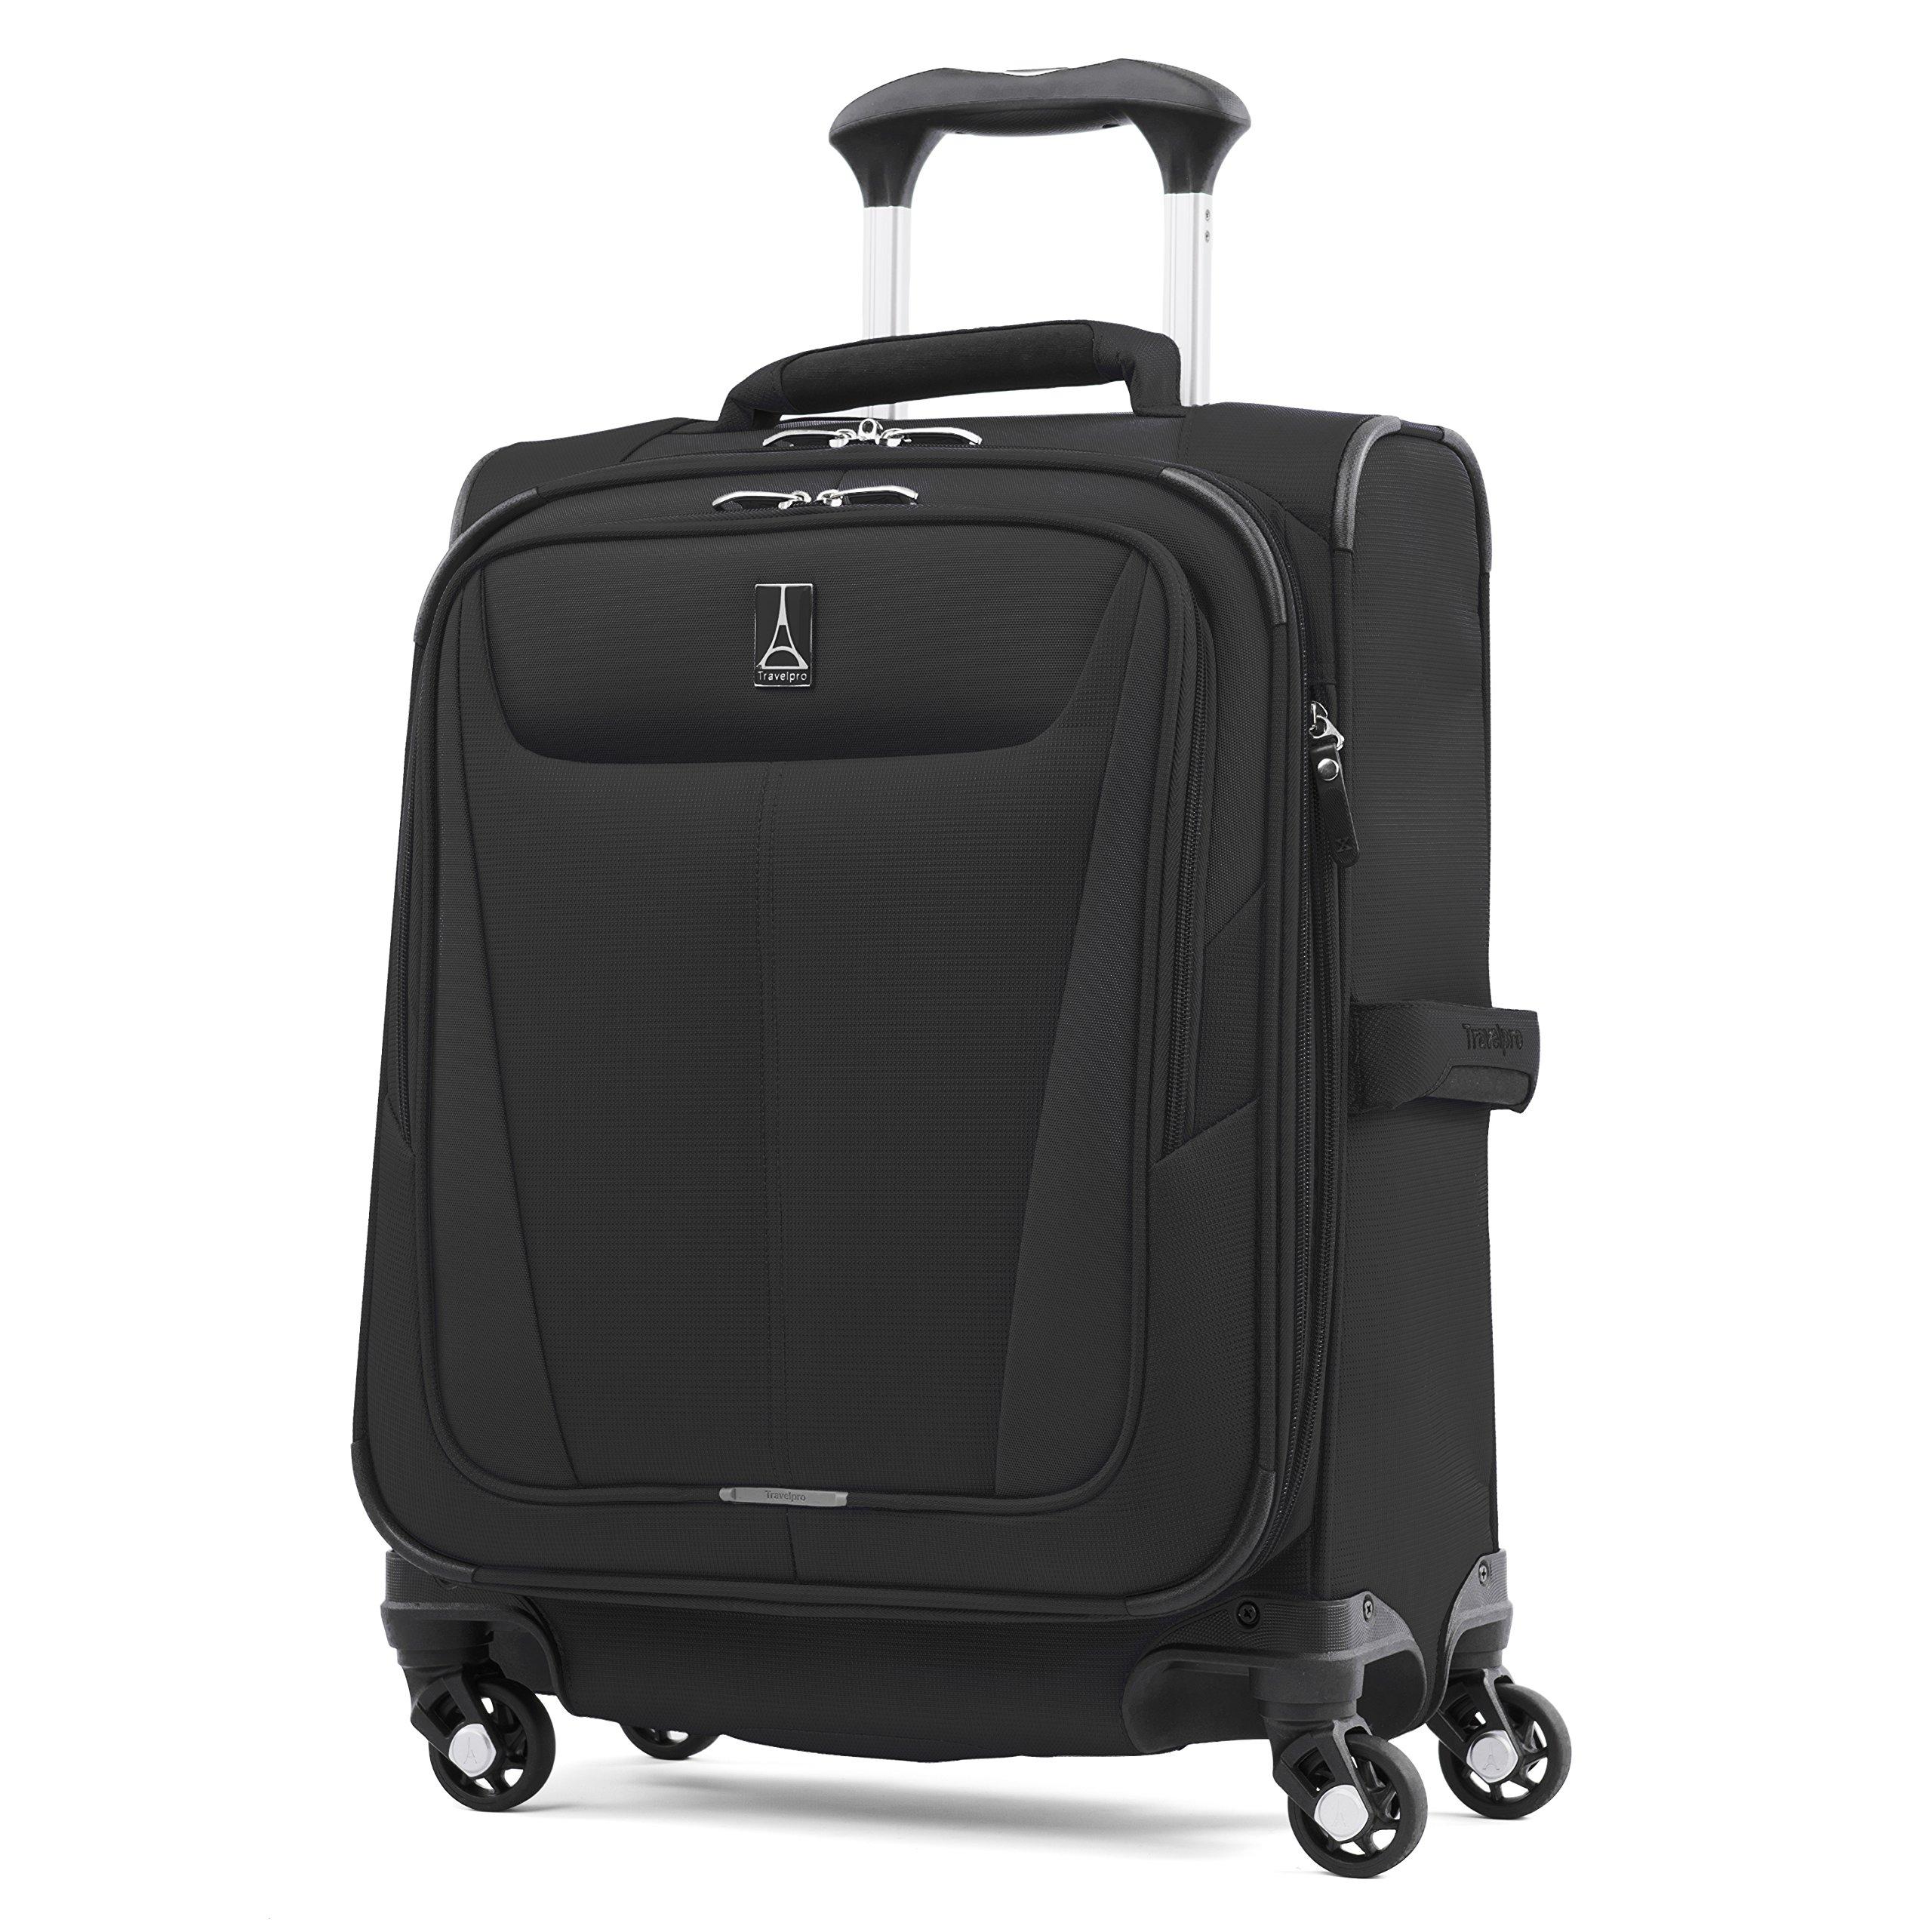 Travelpro Luggage Maxlite 5 International Expandable Spinner Suitcase Carry-On, Black